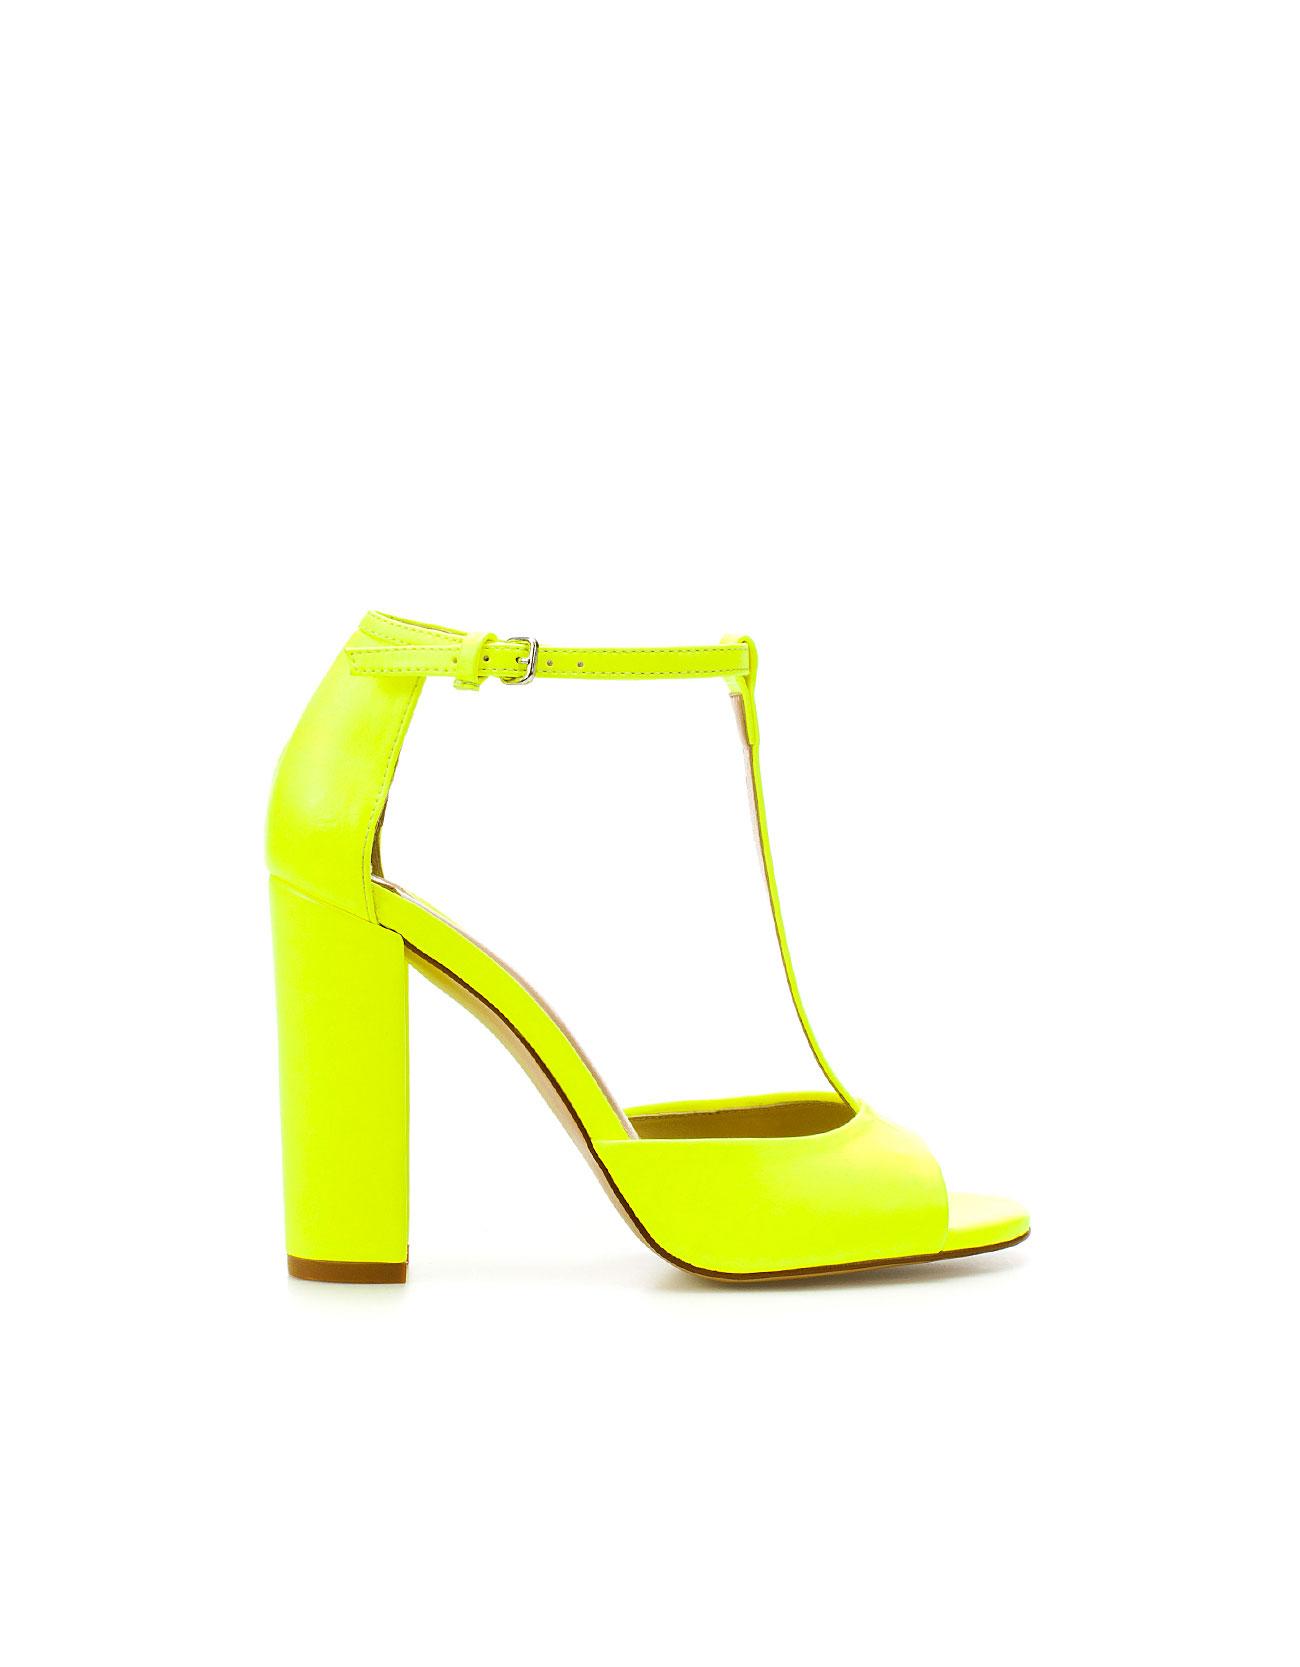 Zara Yellow Heels